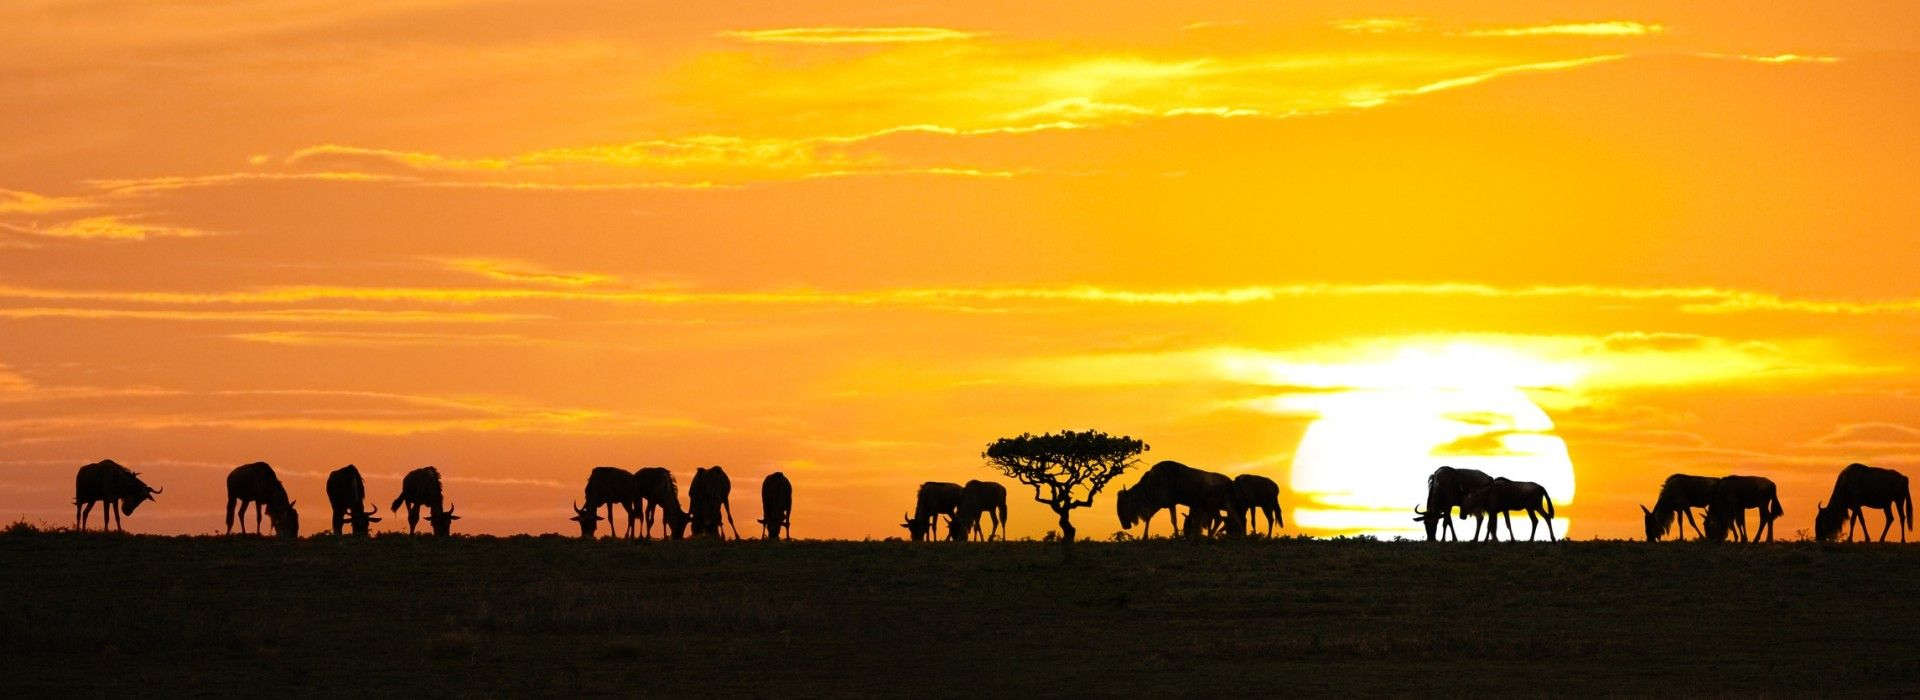 Tanzania Tours and Trips to Tanzania